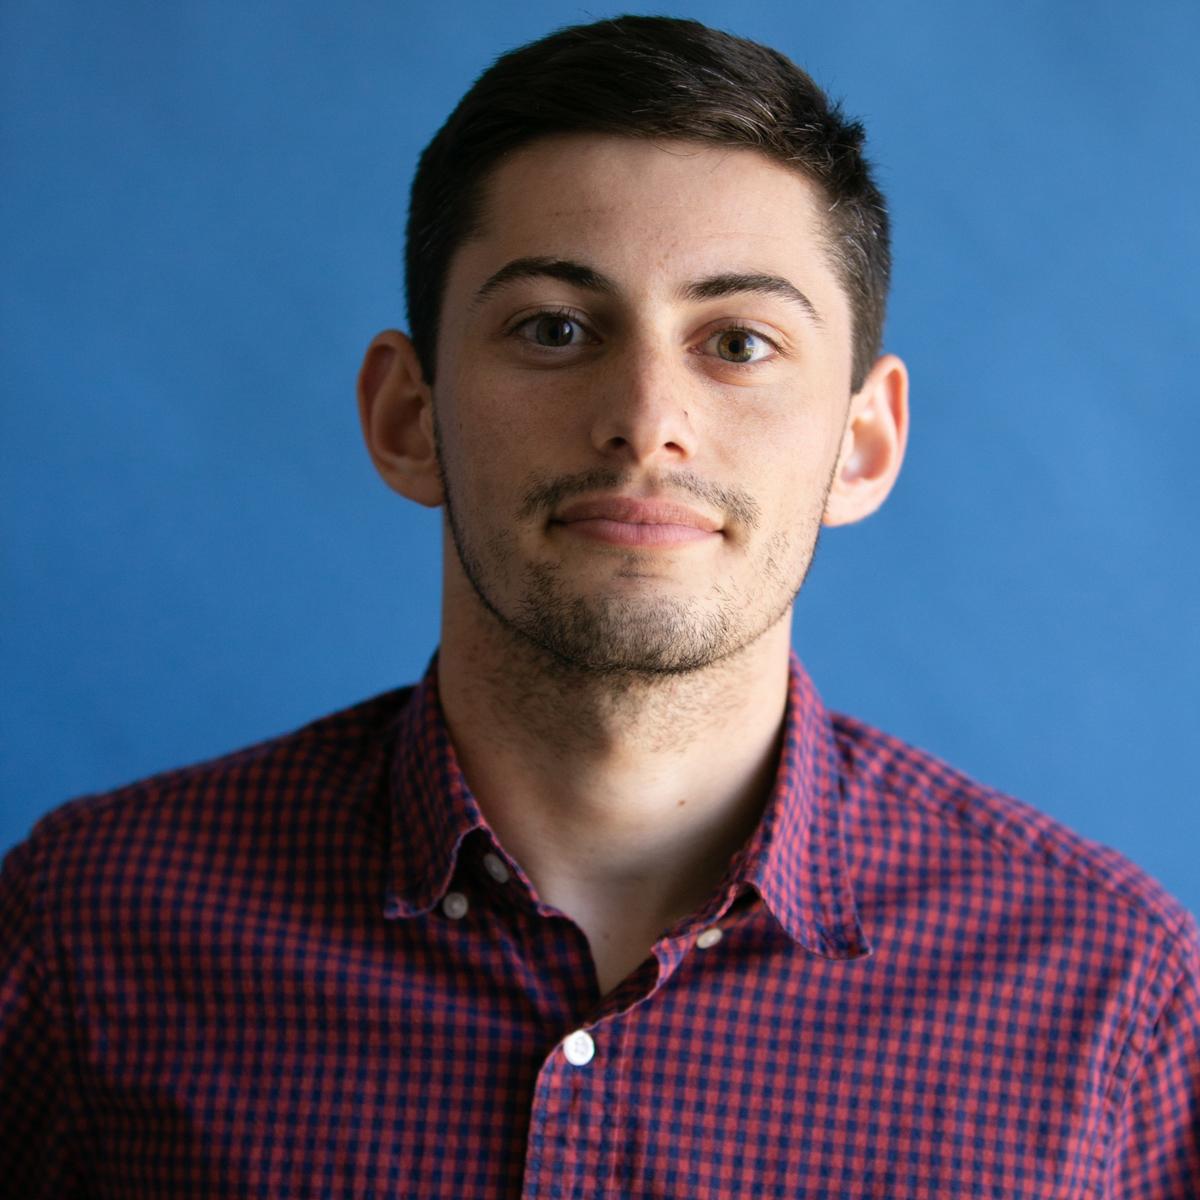 Jordan Wohlfeld - Video Editor + Marketing Manager